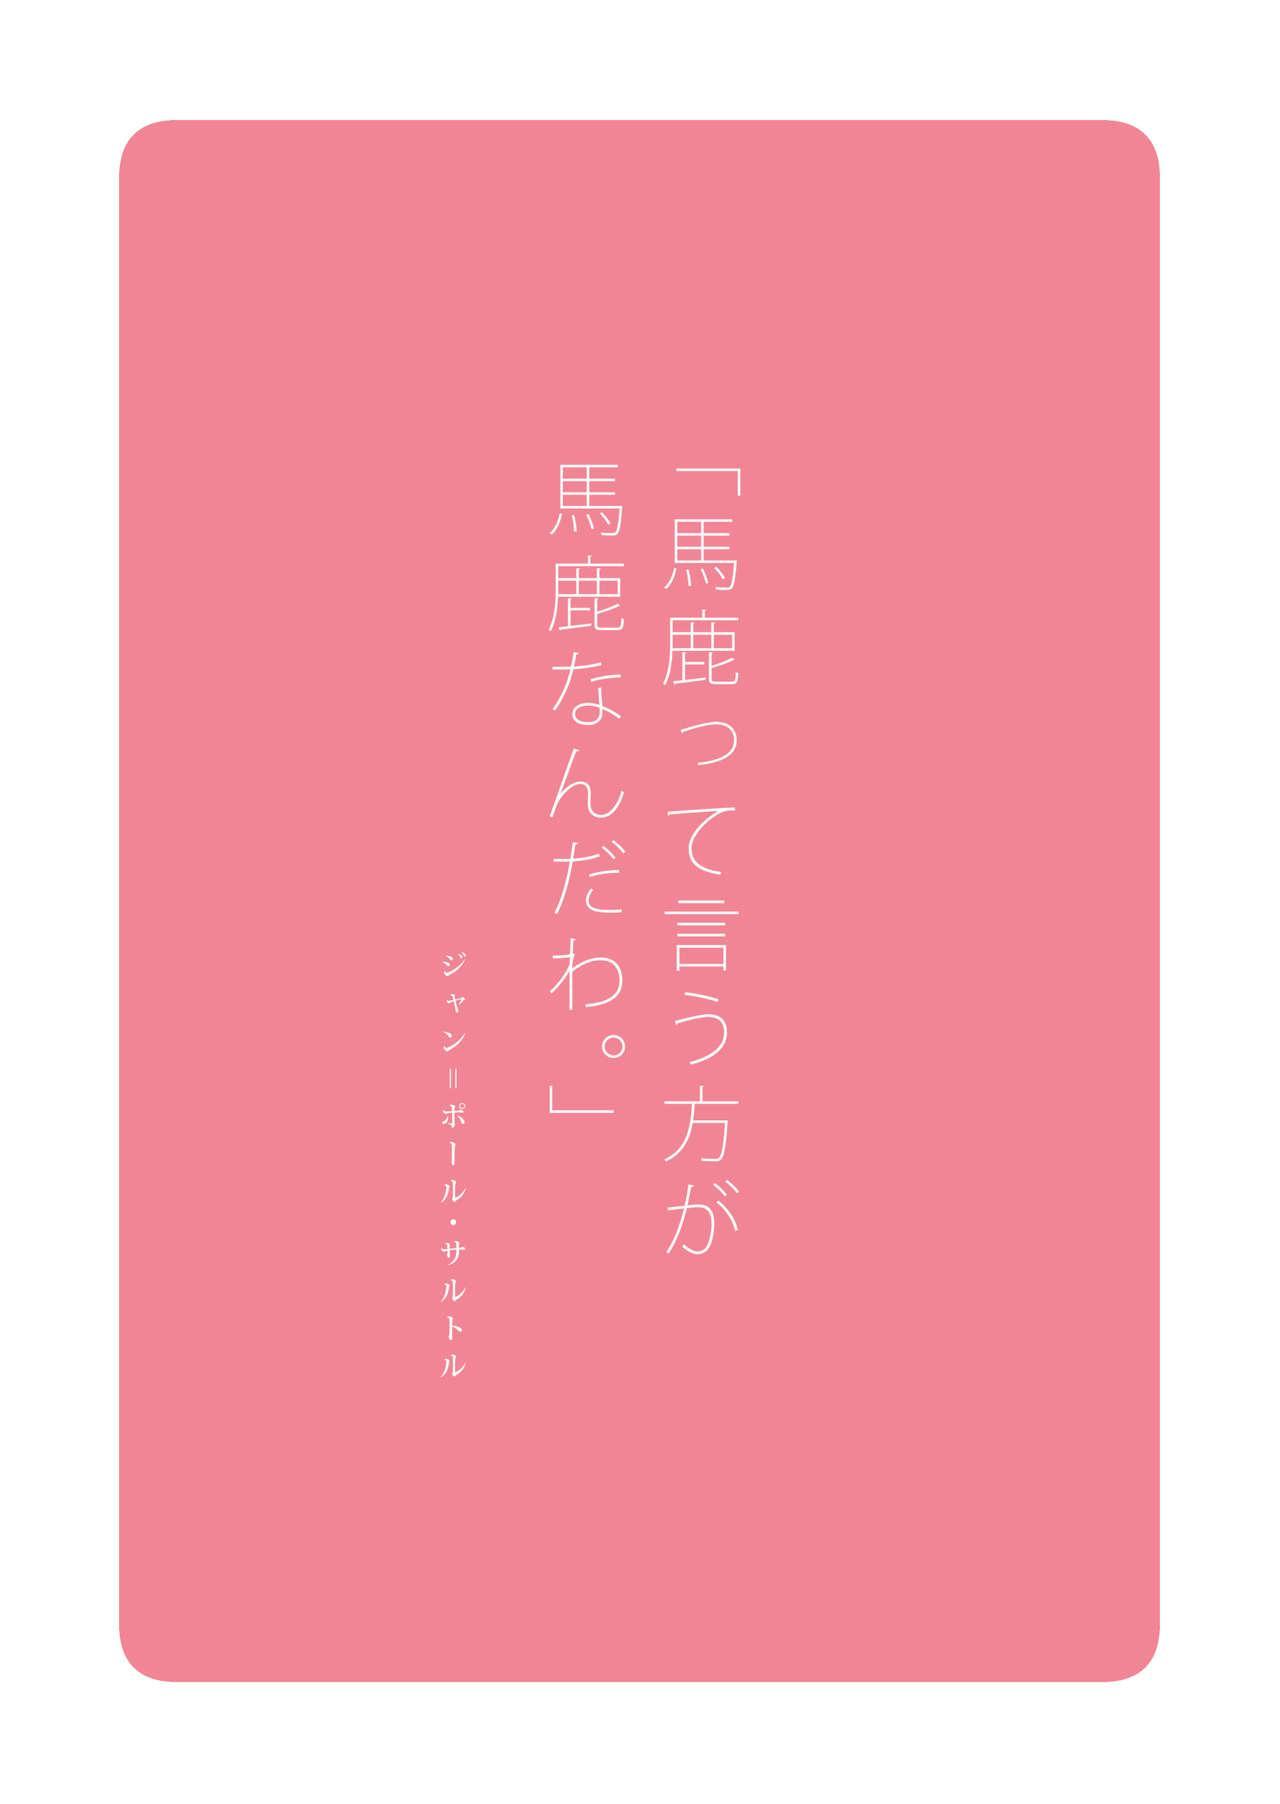 Isogasii Okaasan No Tamuno Sasa Rouzin Seikaigo | Guide for Elderly Sex Health Care to Busy Mom 63